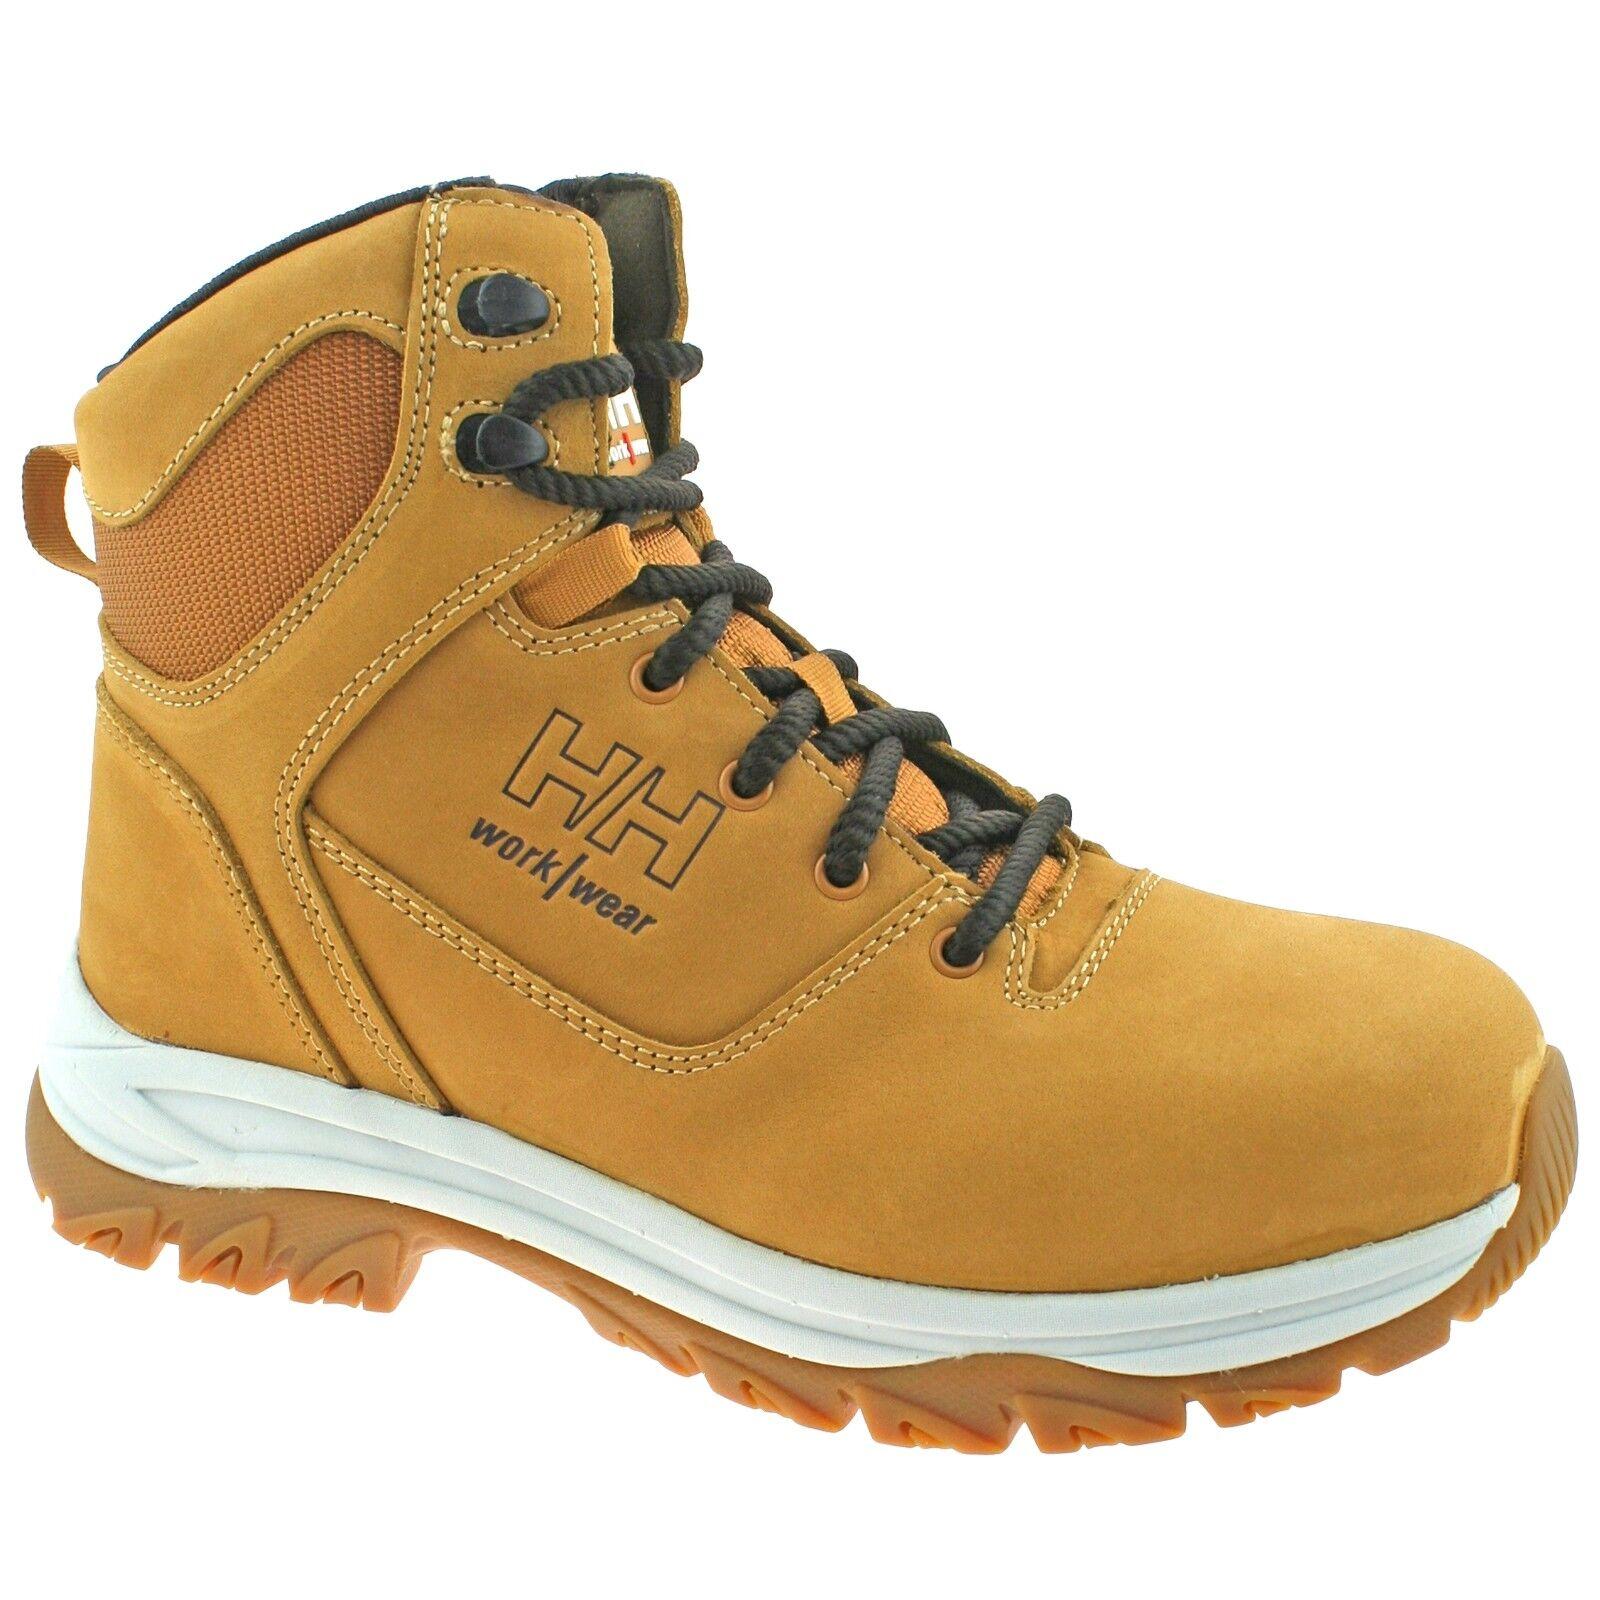 Mens Helly Hansen Ferrous Steel Toe//Midsole S3 Safety Work Boots Sizes 7 to 13